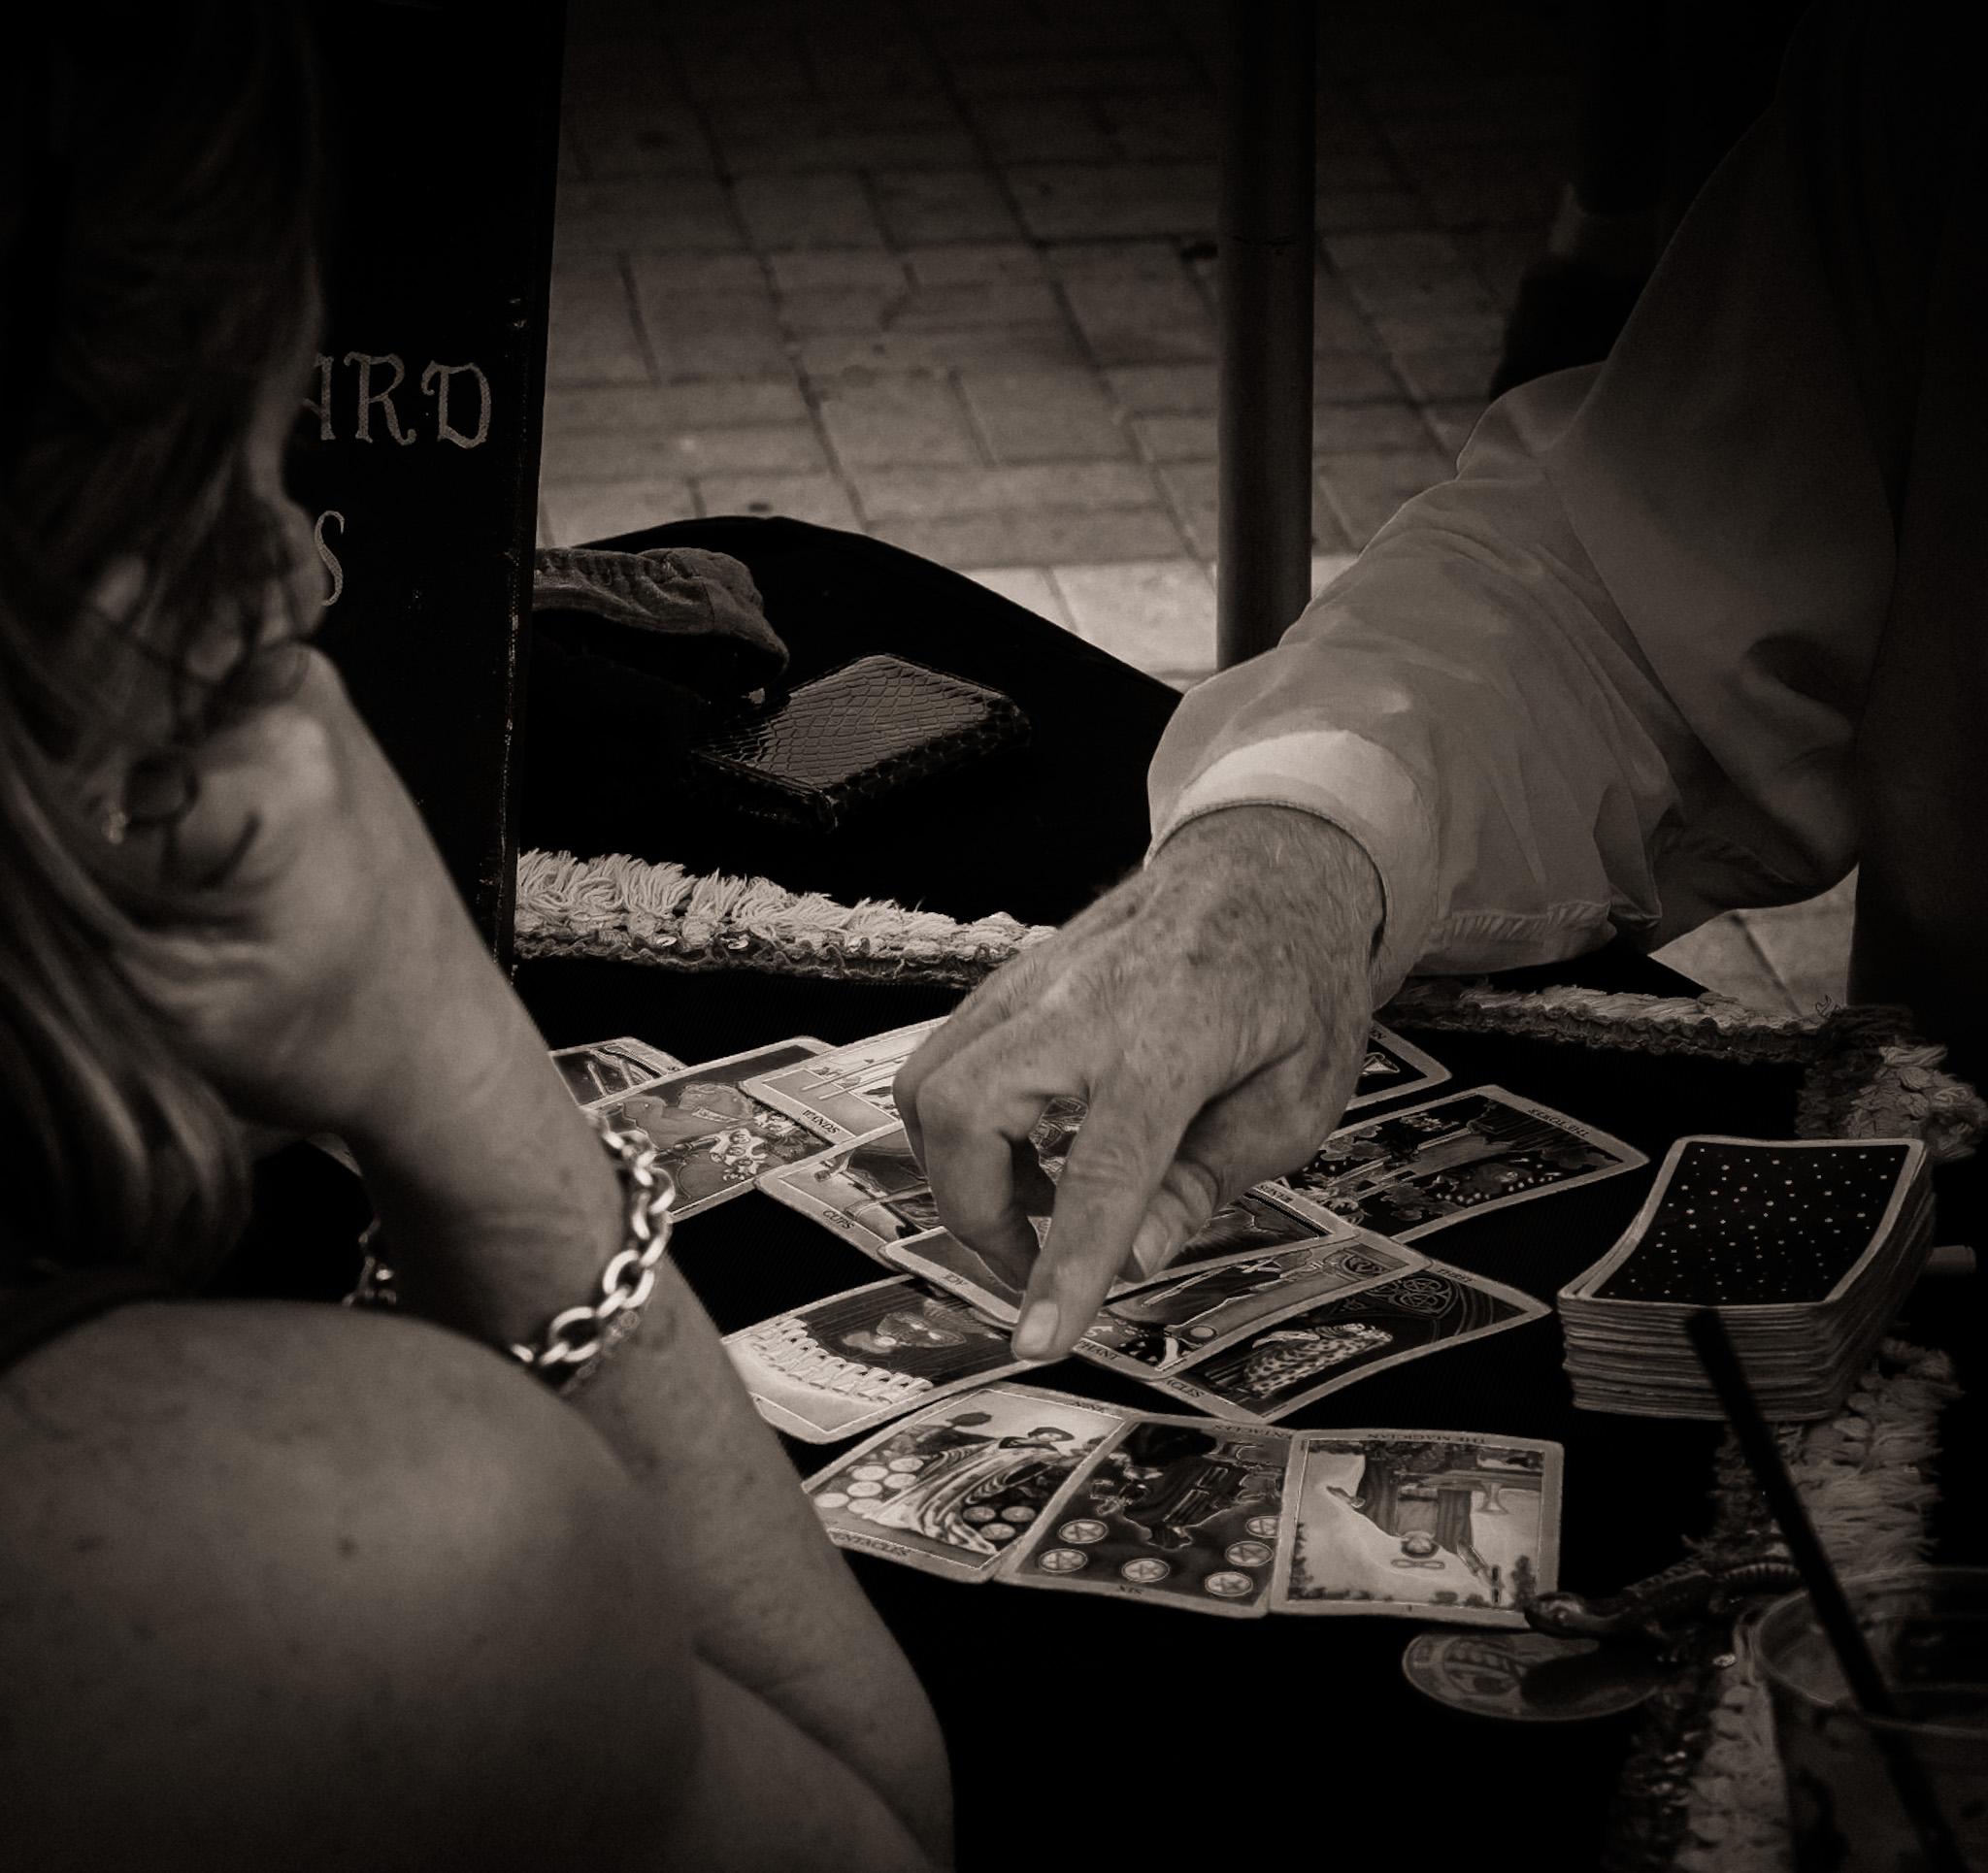 Fortune Teller Reading Tarot Cards - Key West, Florida